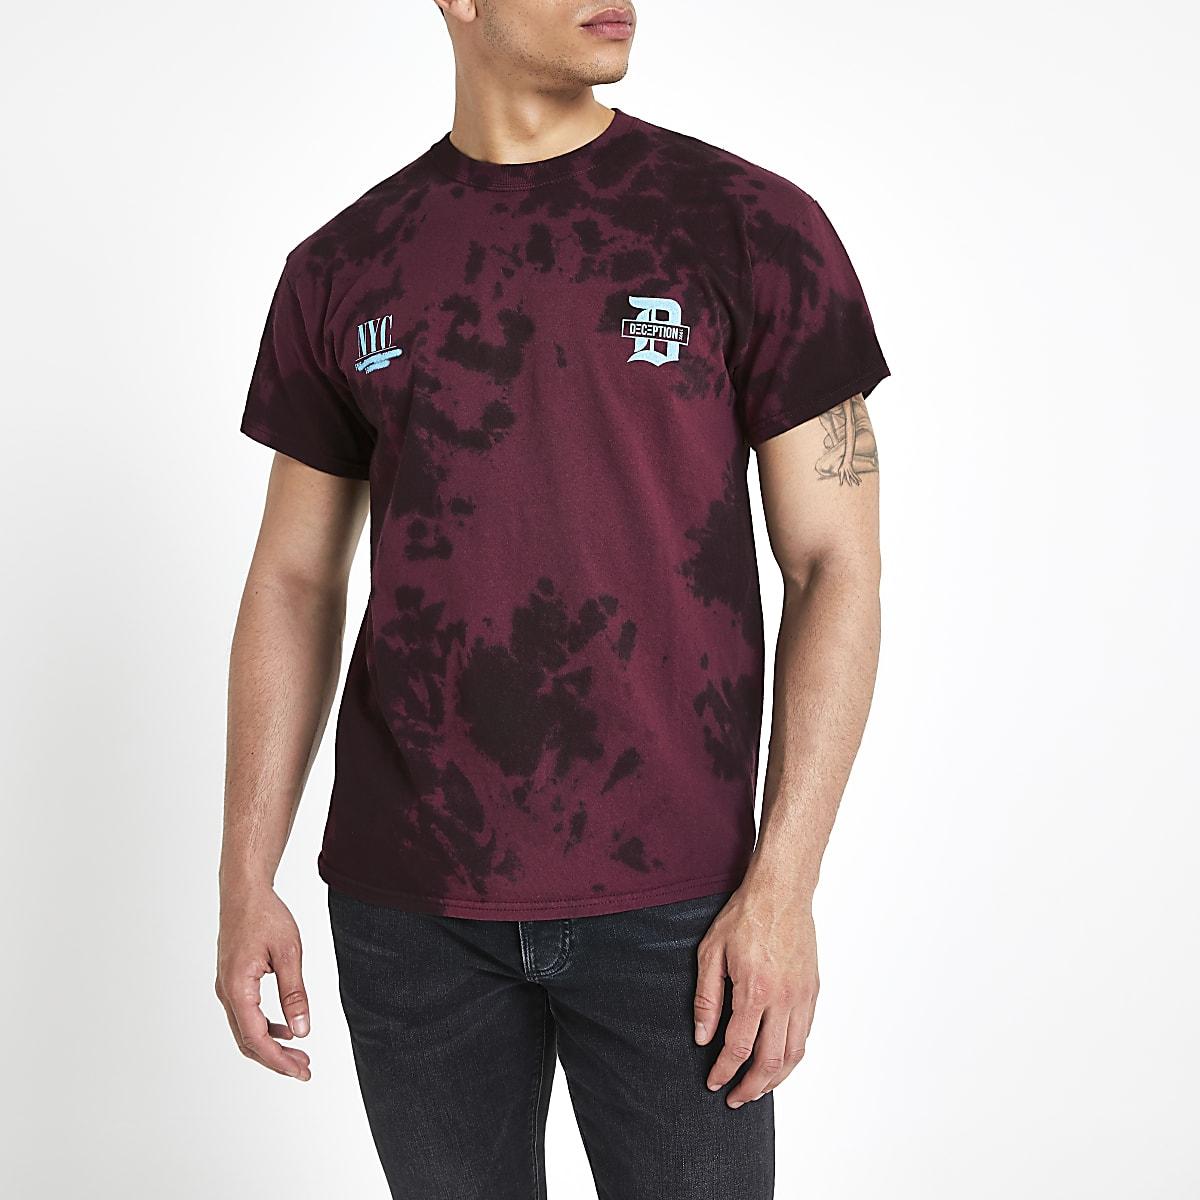 Burgundy tie dye T-shirt